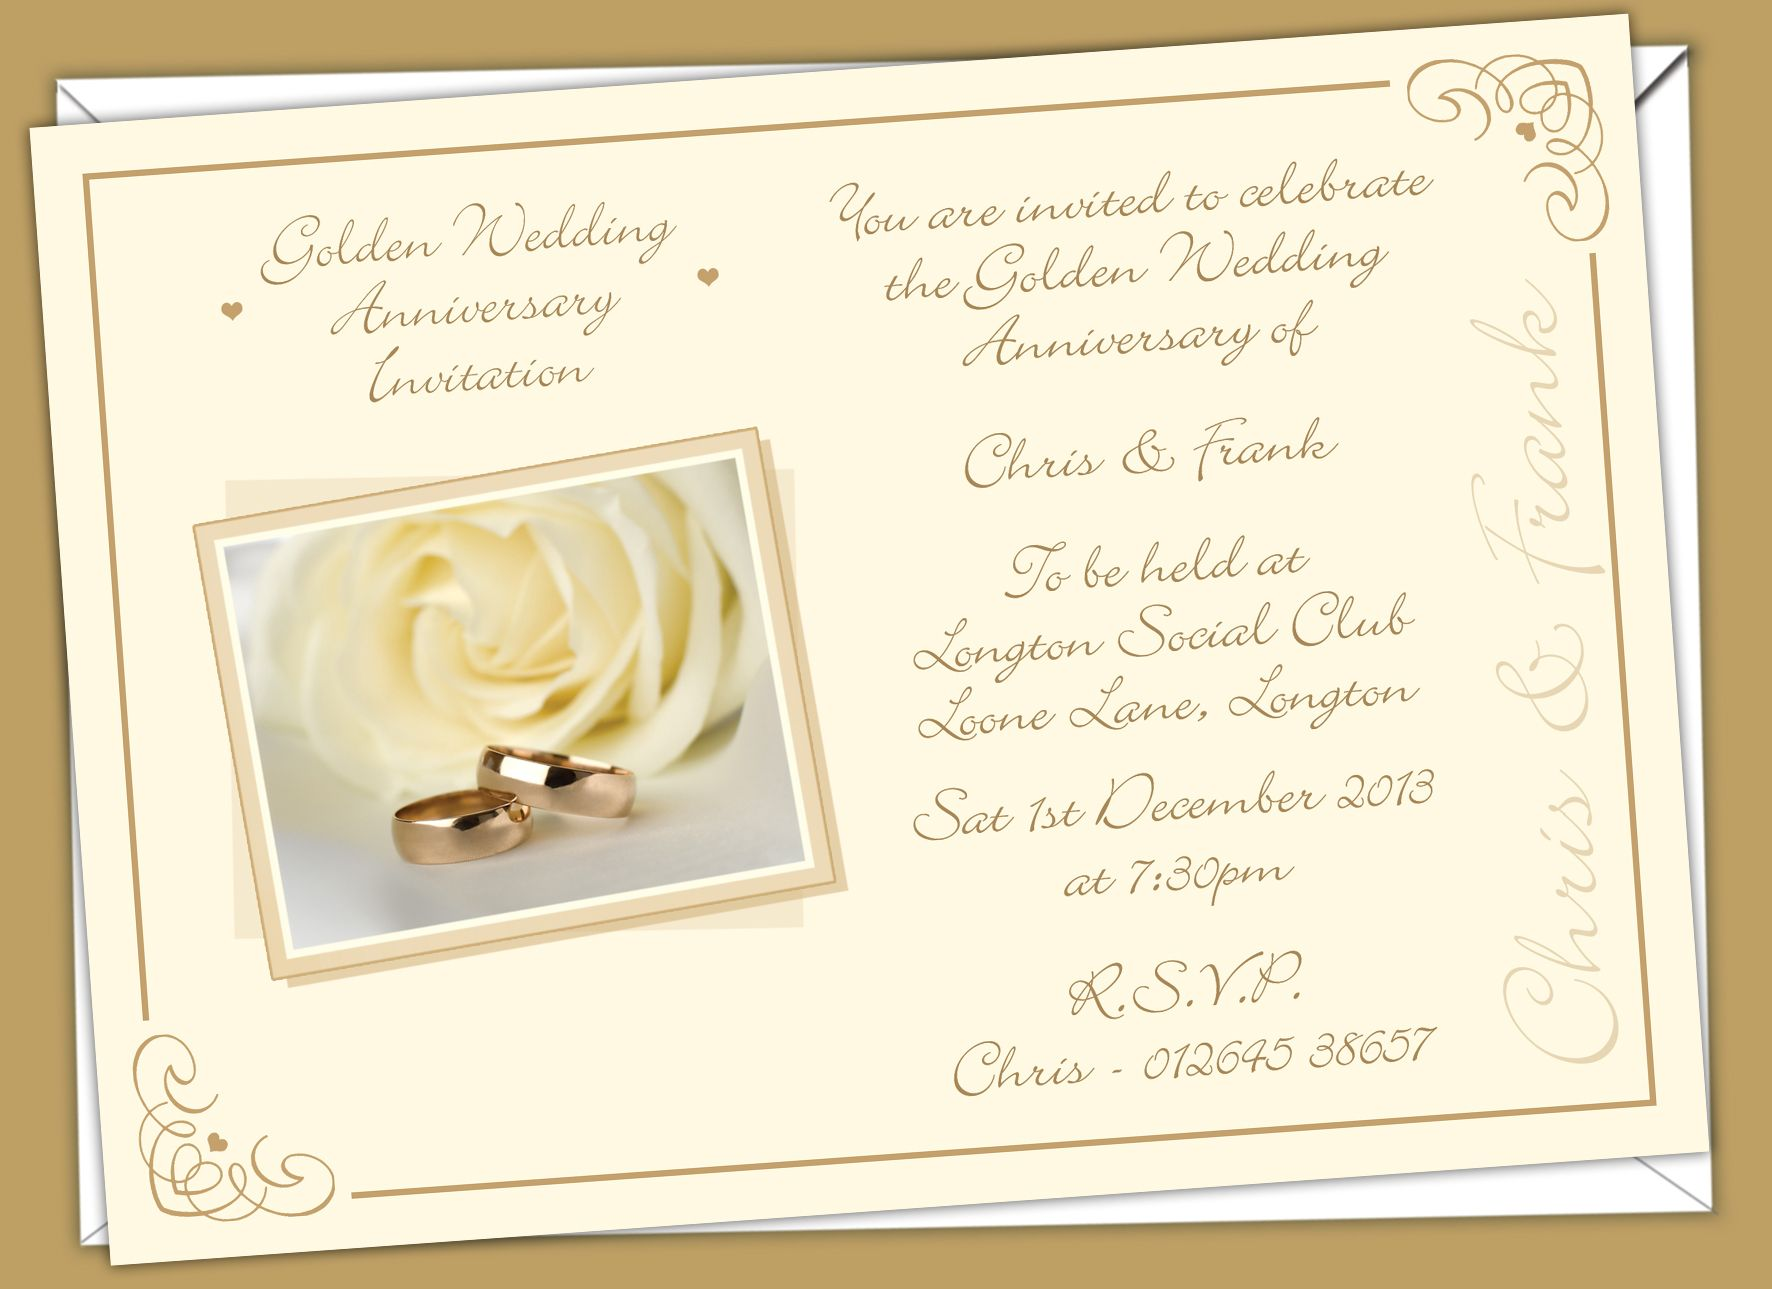 Golden Wedding Anniversary Invitations Prices Start From 6 50 Golden Wedding Anniversary Invitations Anniversary Invitations Wedding Anniversary Invitations